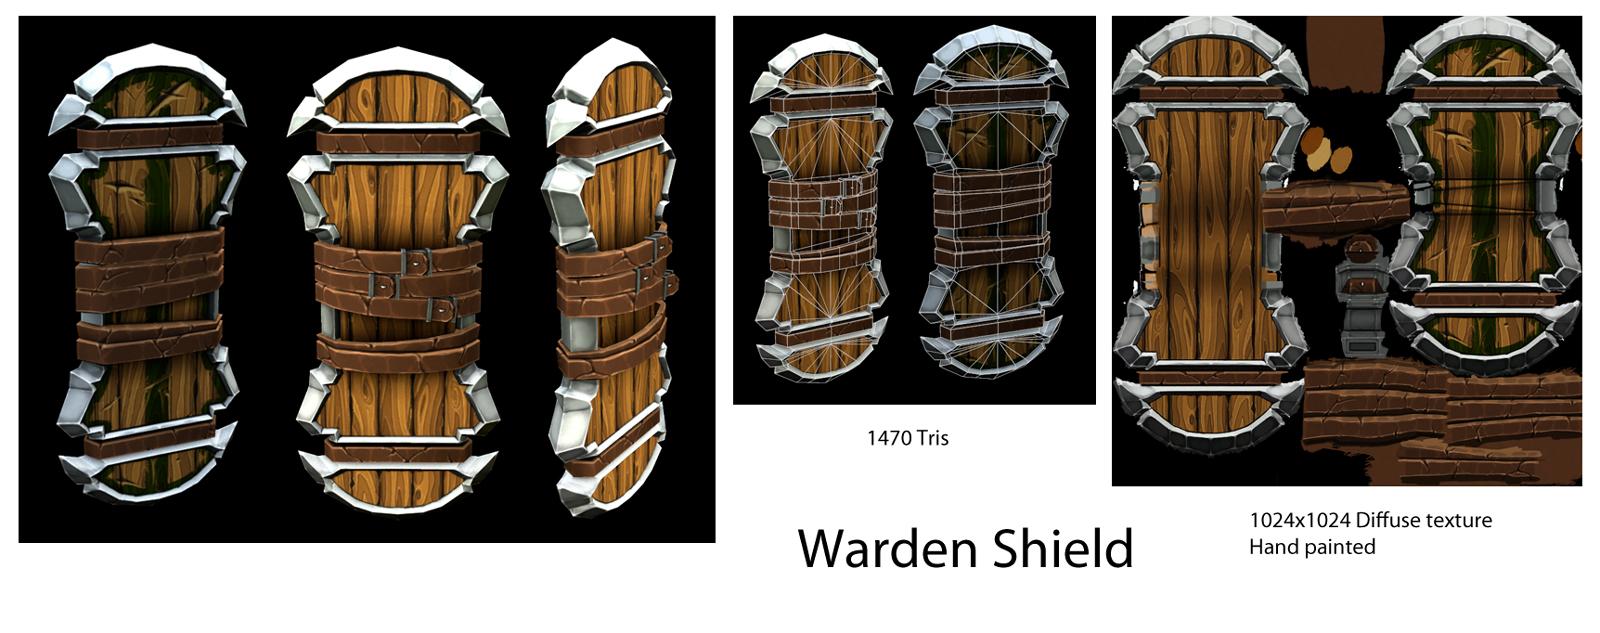 Warden_shield_01.jpg